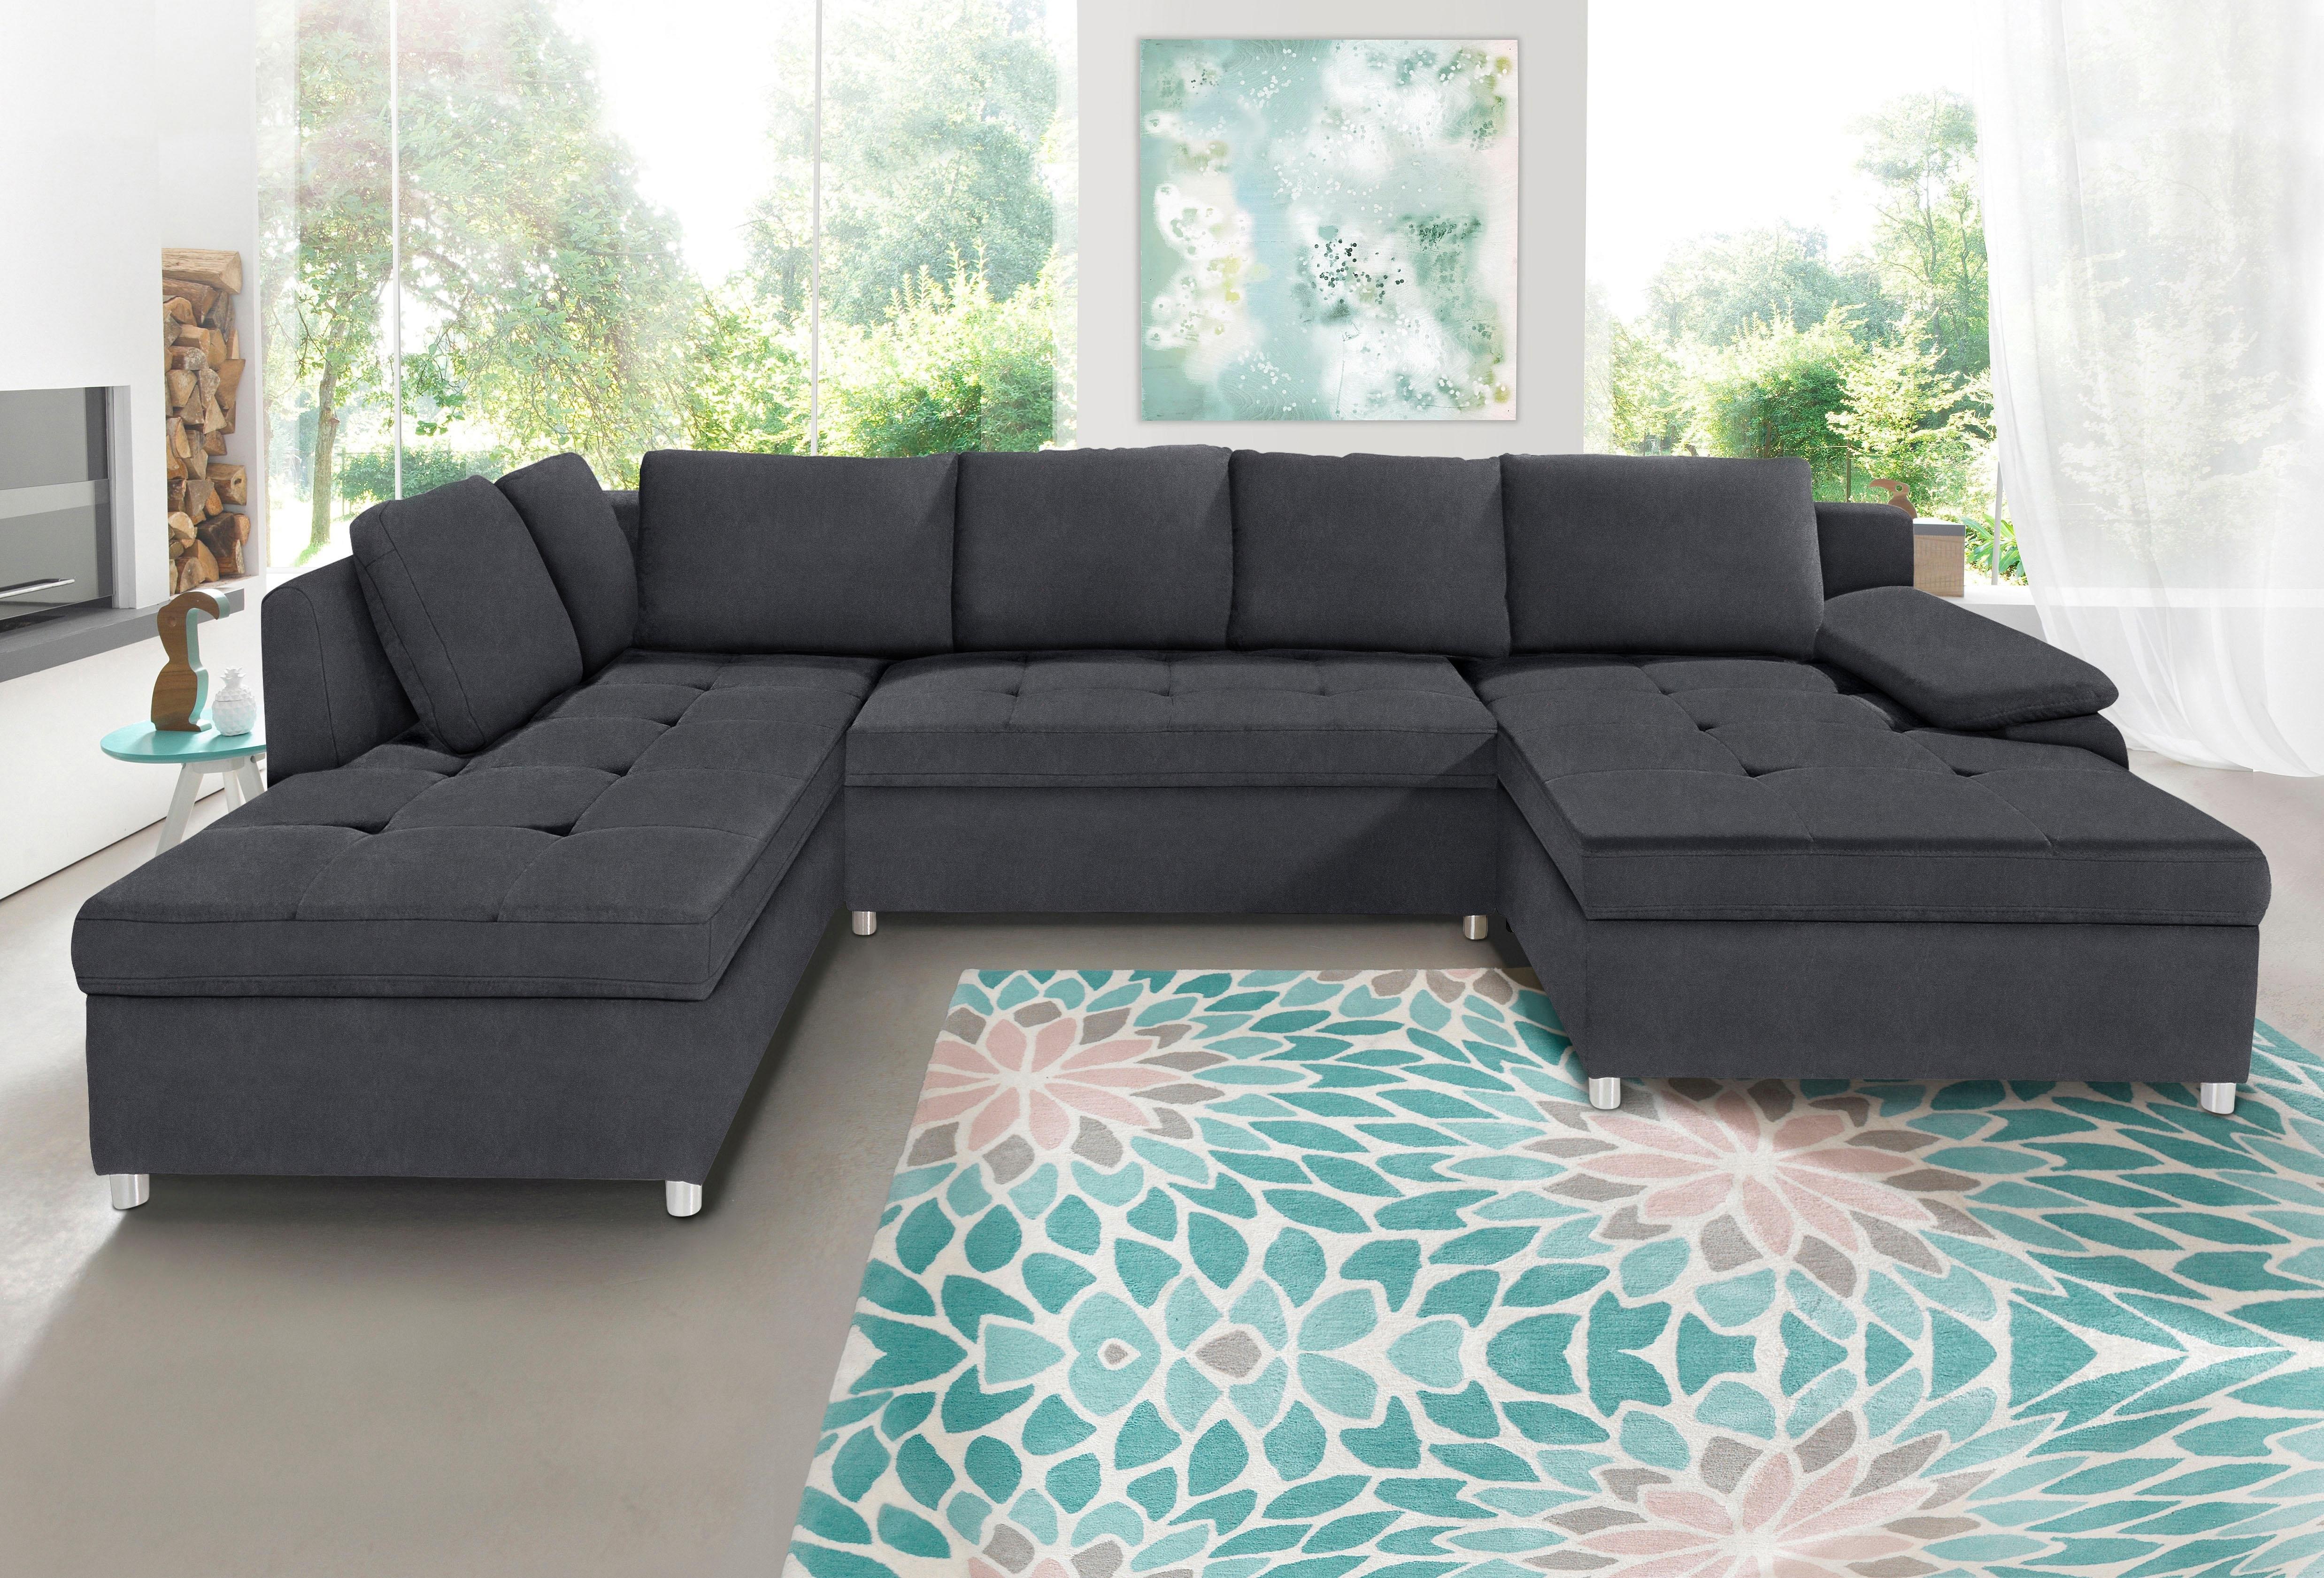 Zithoek fabulous zithoek woonkamer with zithoek trendy filewlanl adfoto zithoek in huis - Couchgarnituren bei otto ...